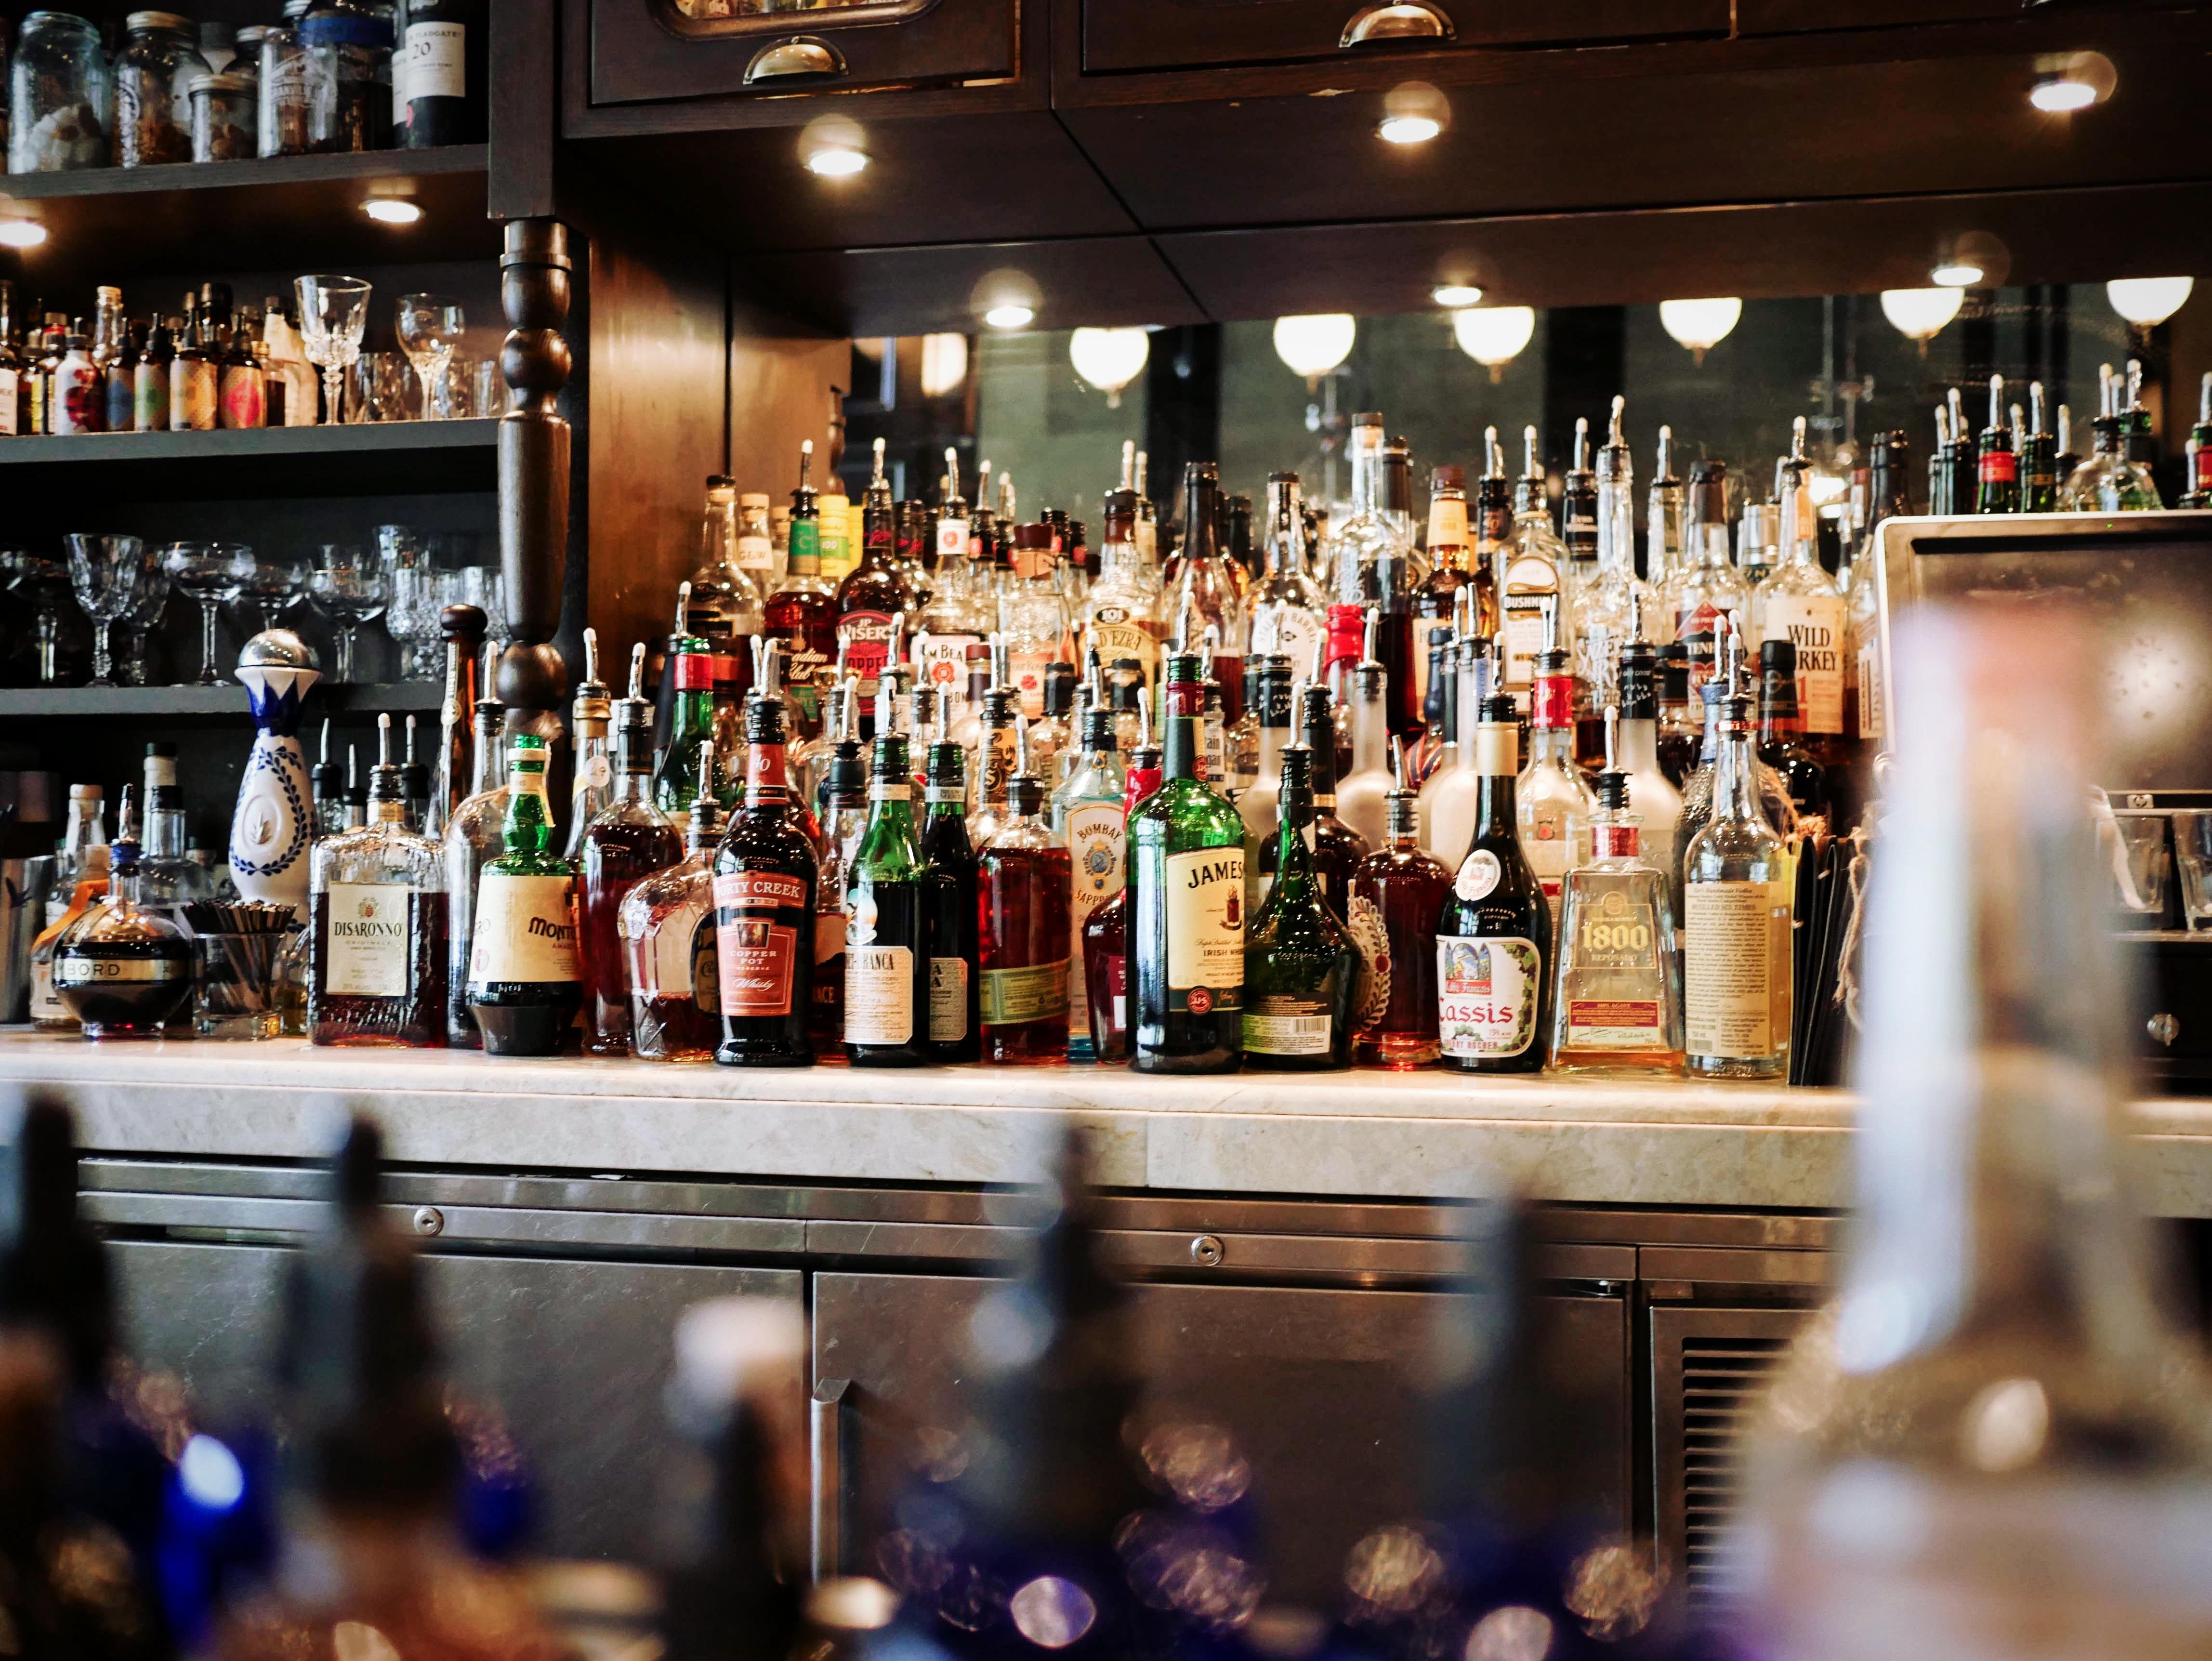 Fotos gratis : bar, mostrador, beber, cerveza, barman, estantería ...